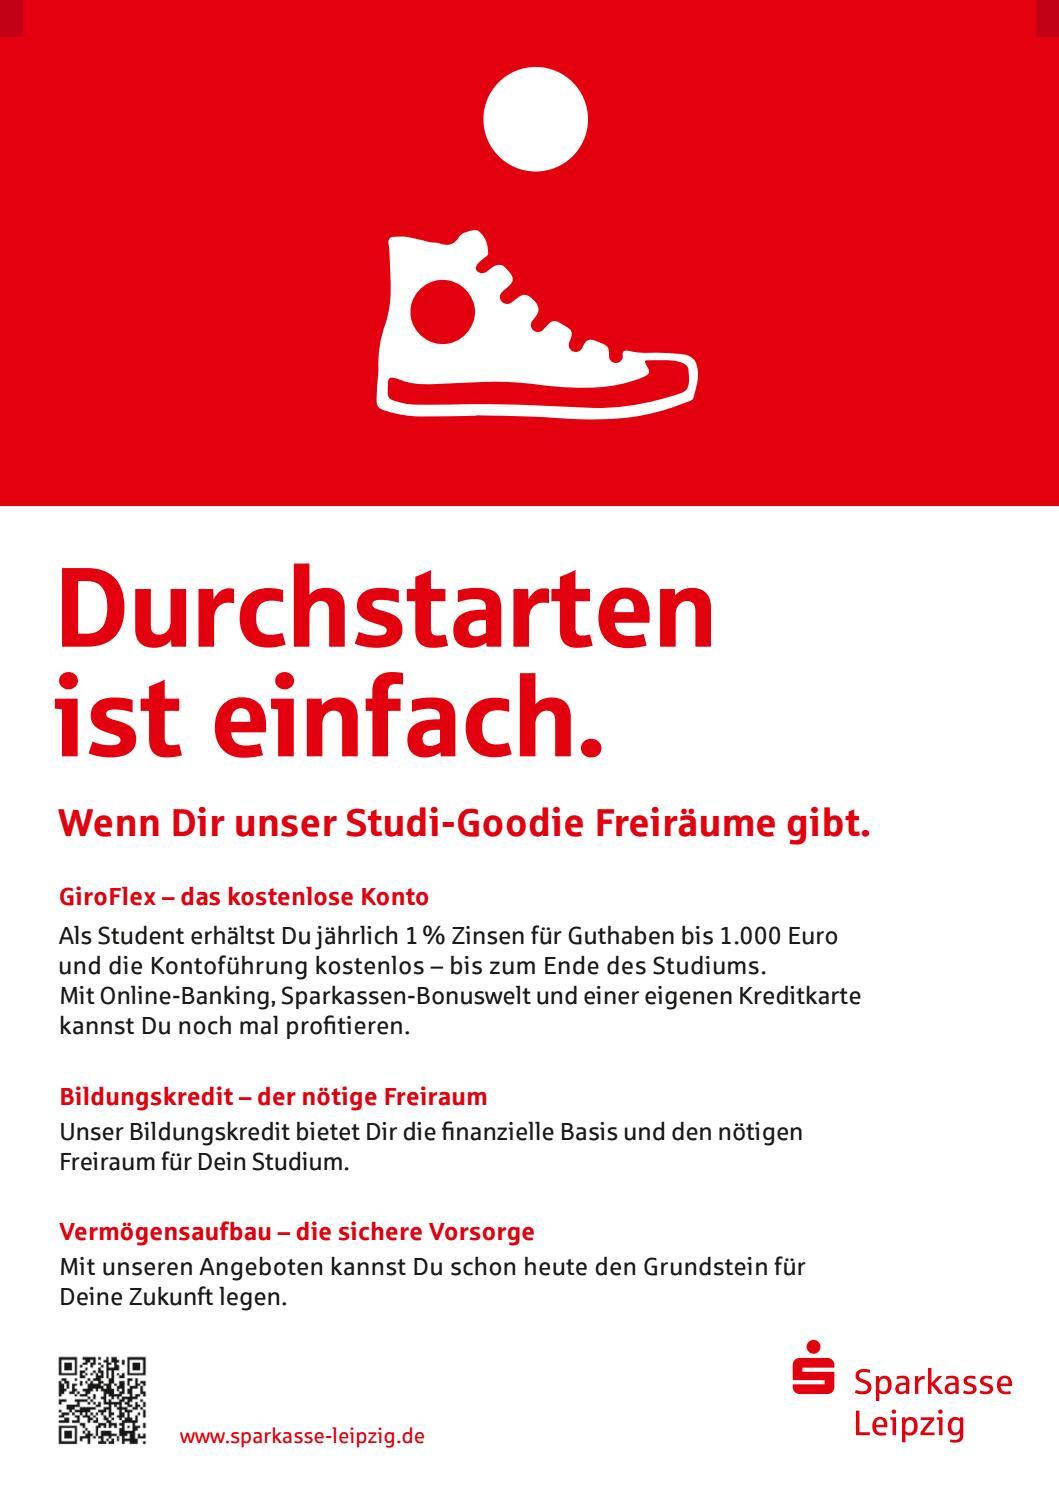 www.sparkasse leipzig online